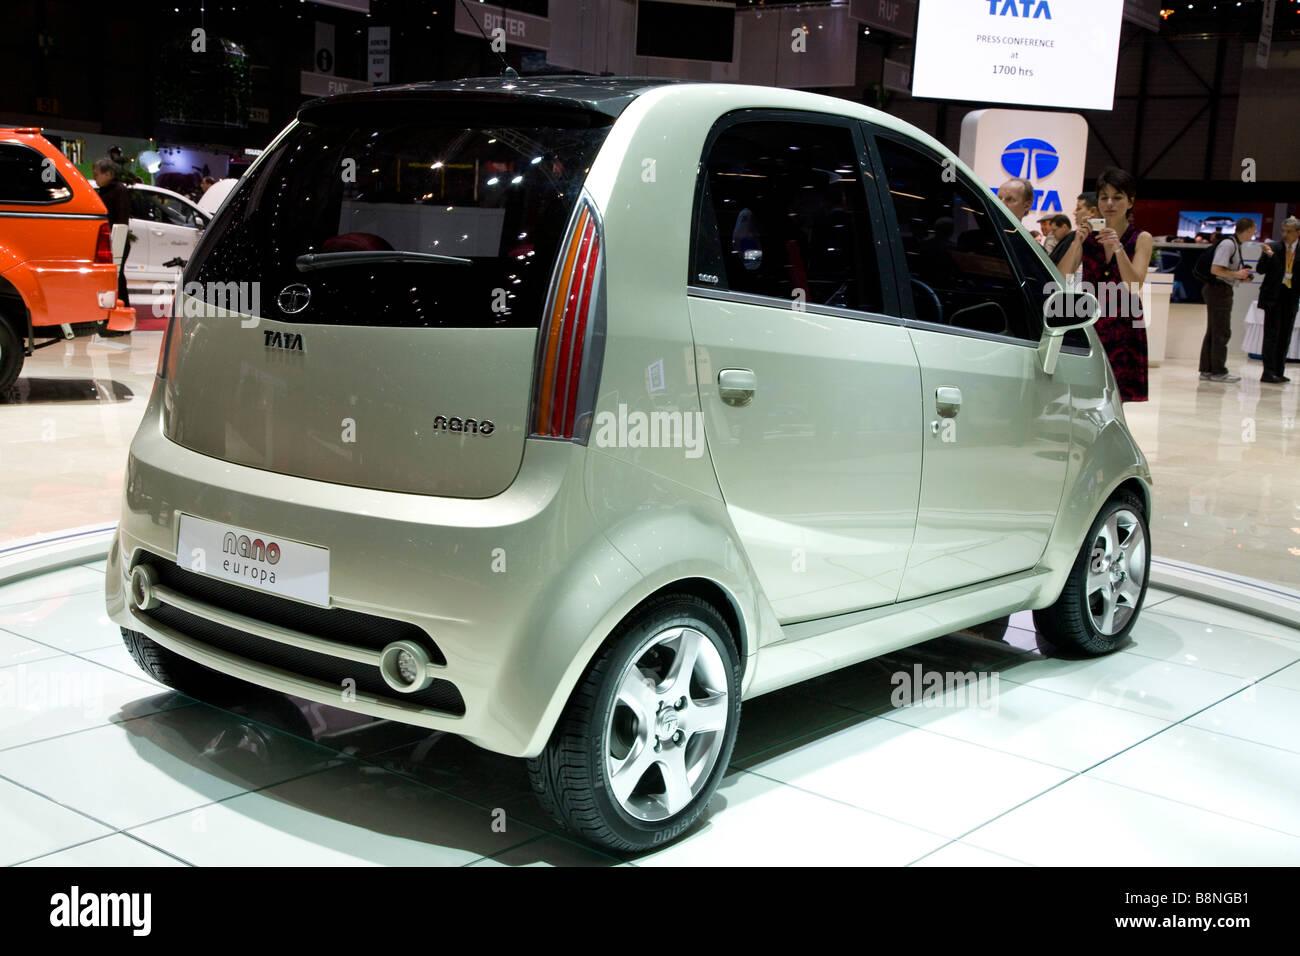 Tata Nano Europa exhibit at a motor show. - Stock Image